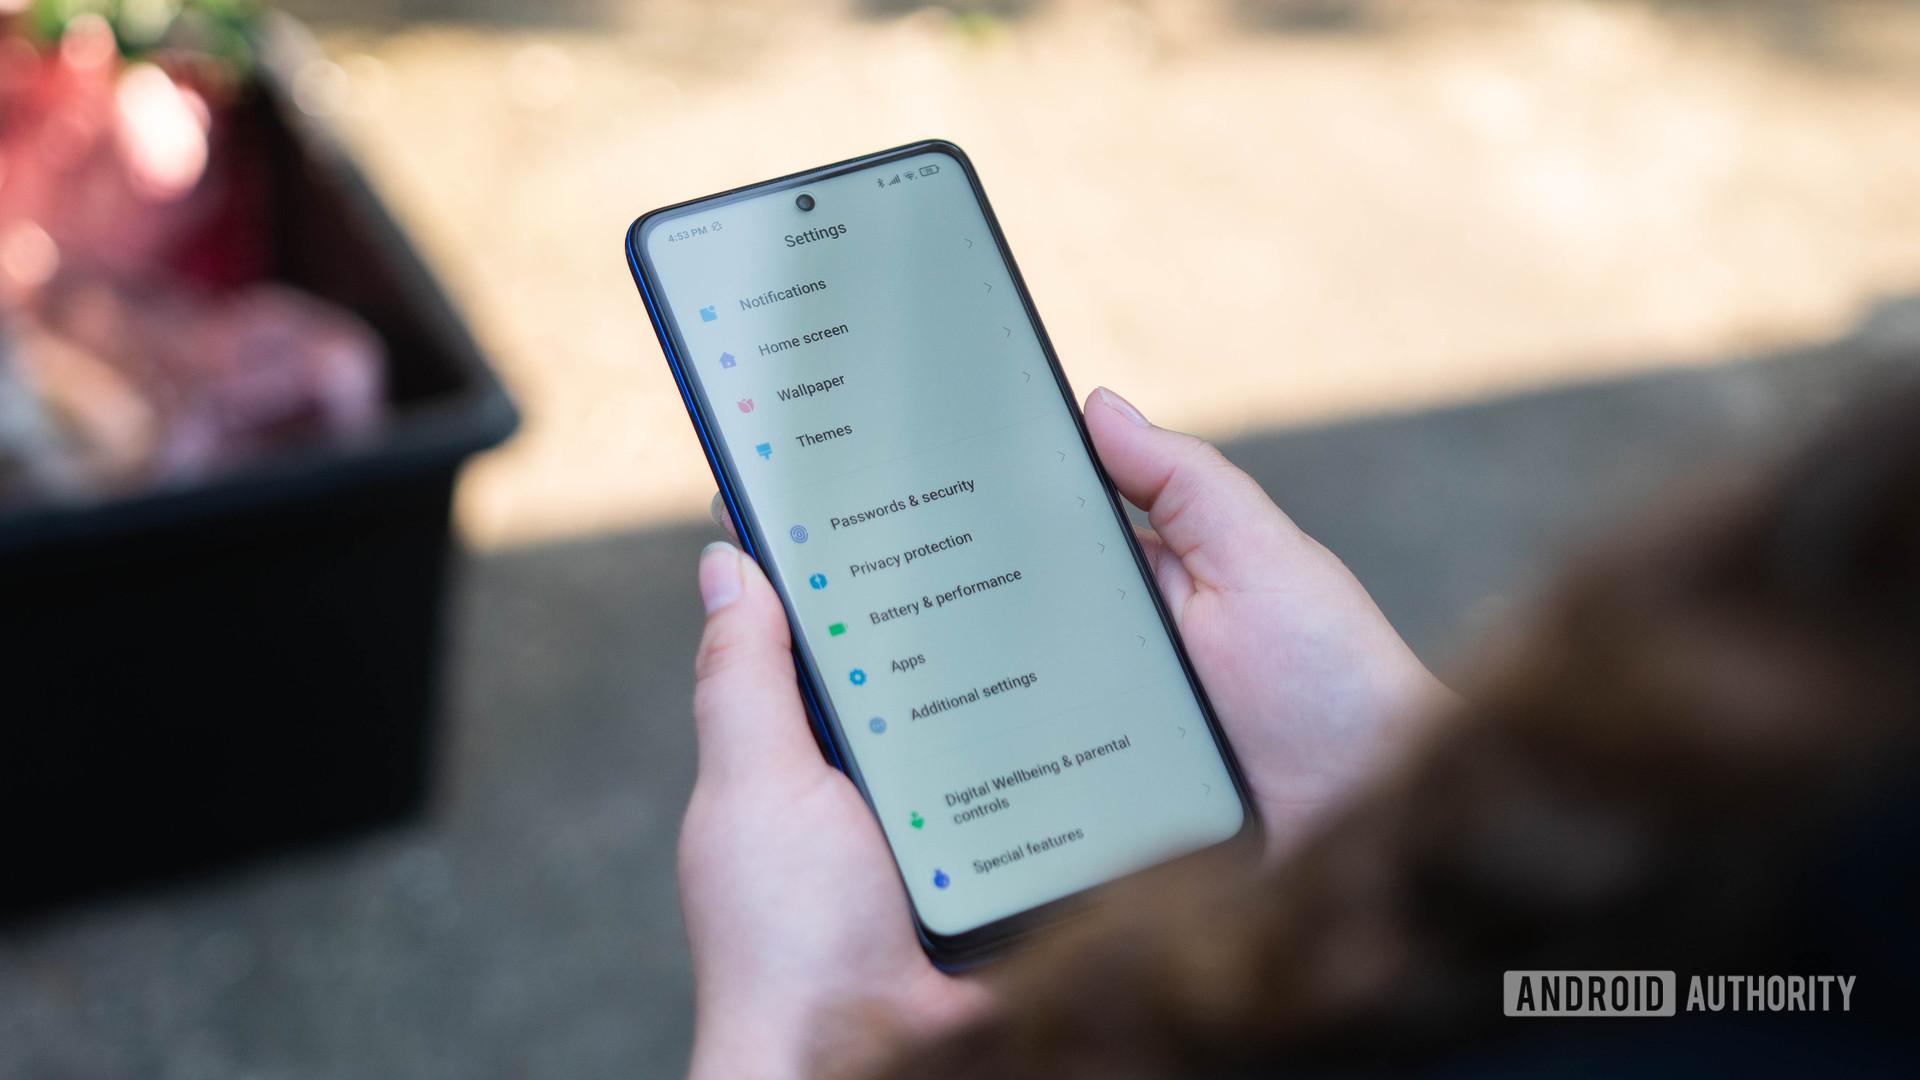 Xiaomi Poco X3 NFC settings menu held in the hand